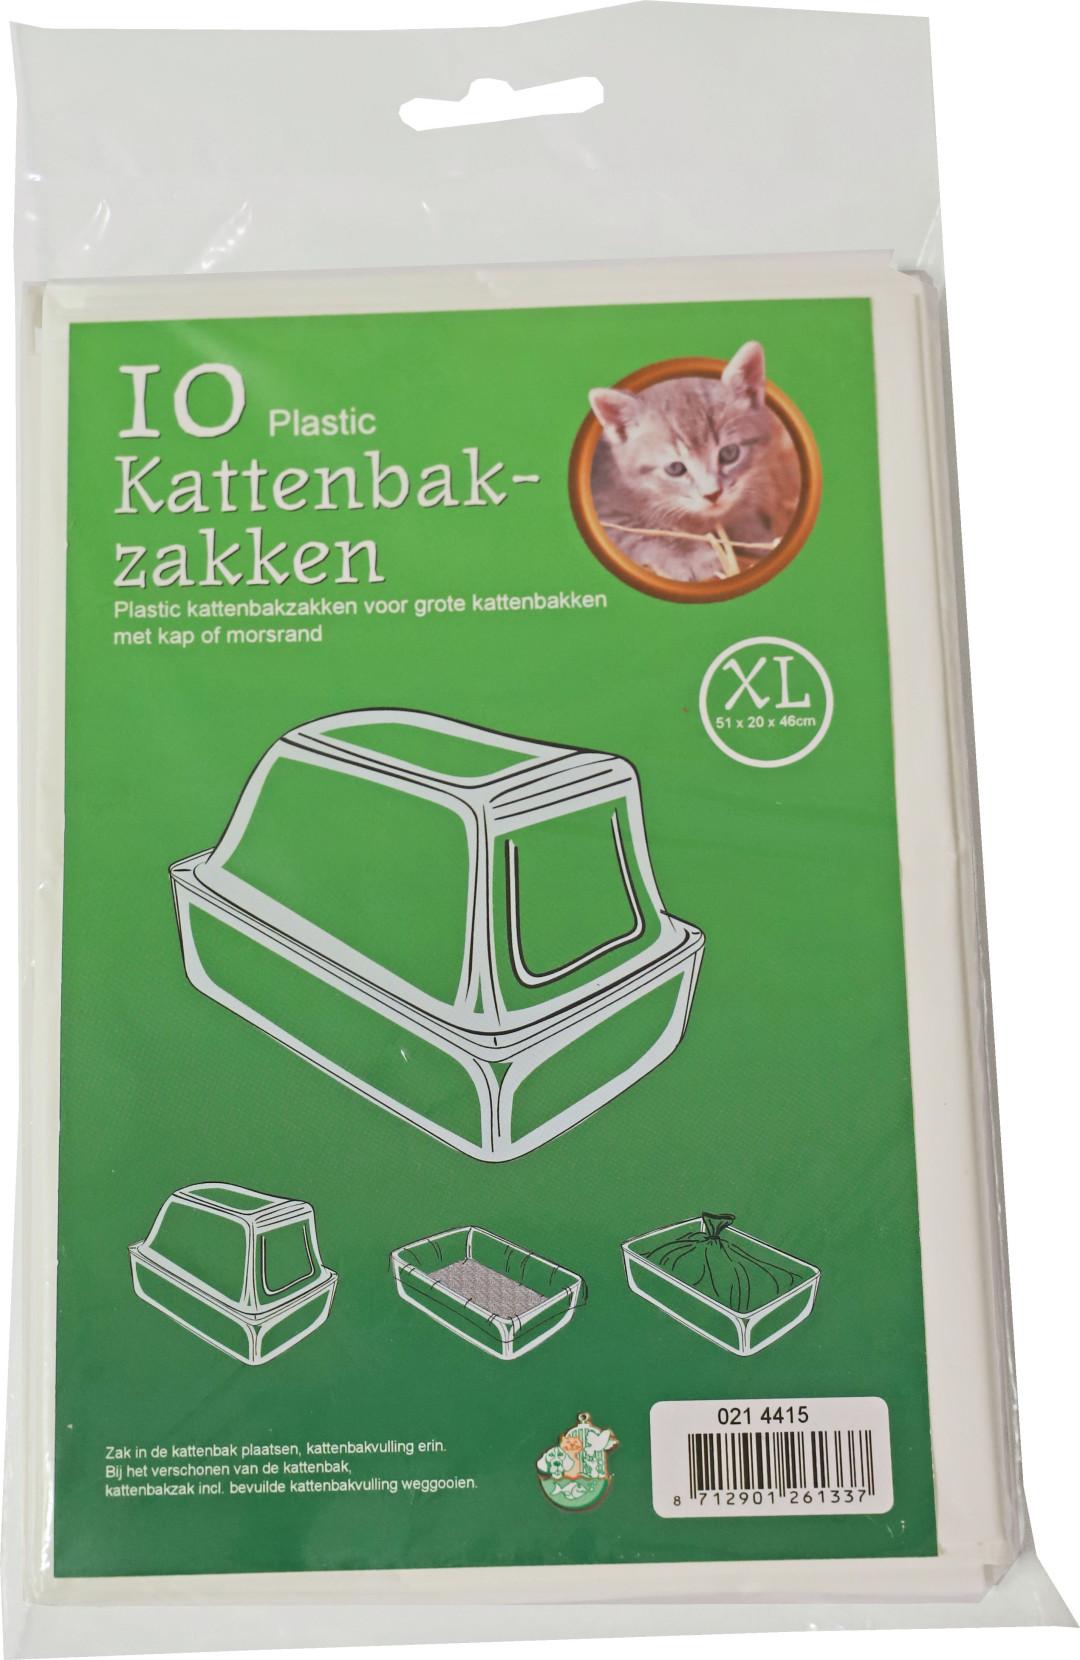 Kattenbakzakken XL <br>10 st wit